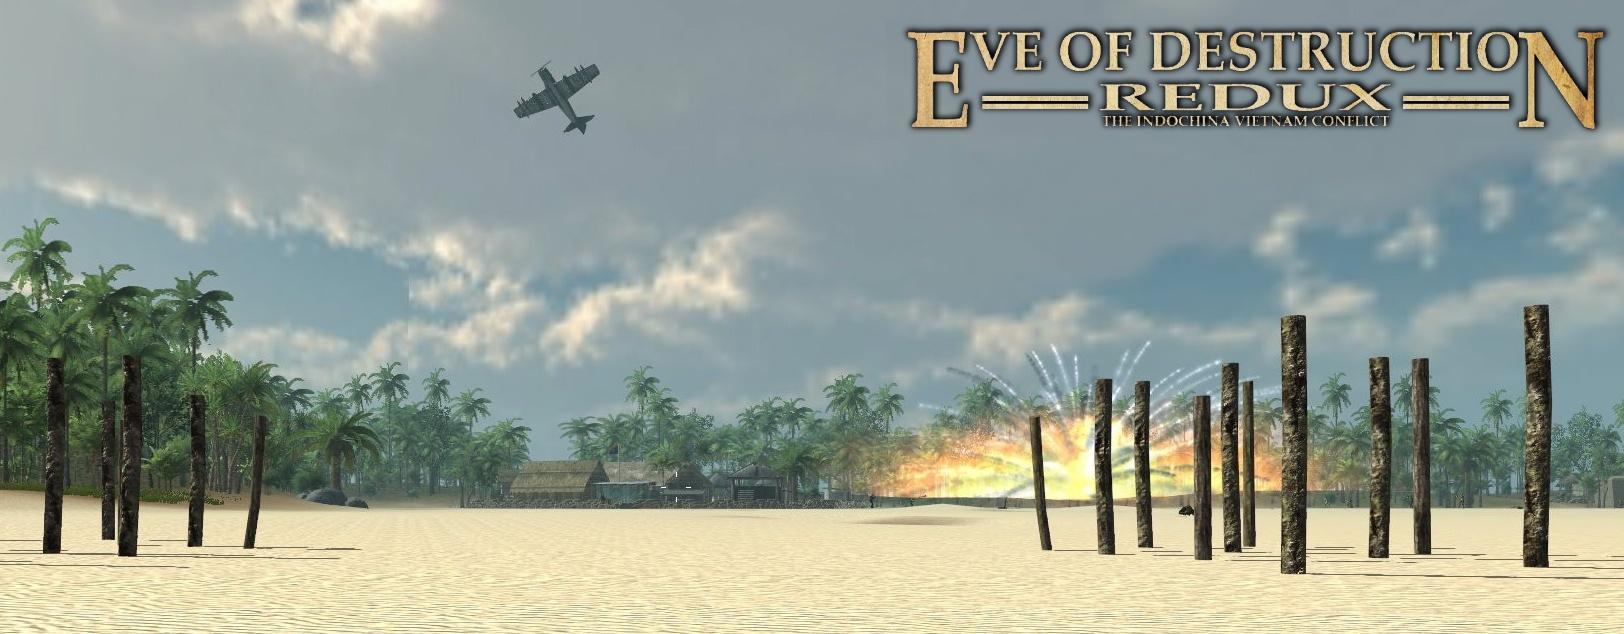 Skyraider bombing a beach village